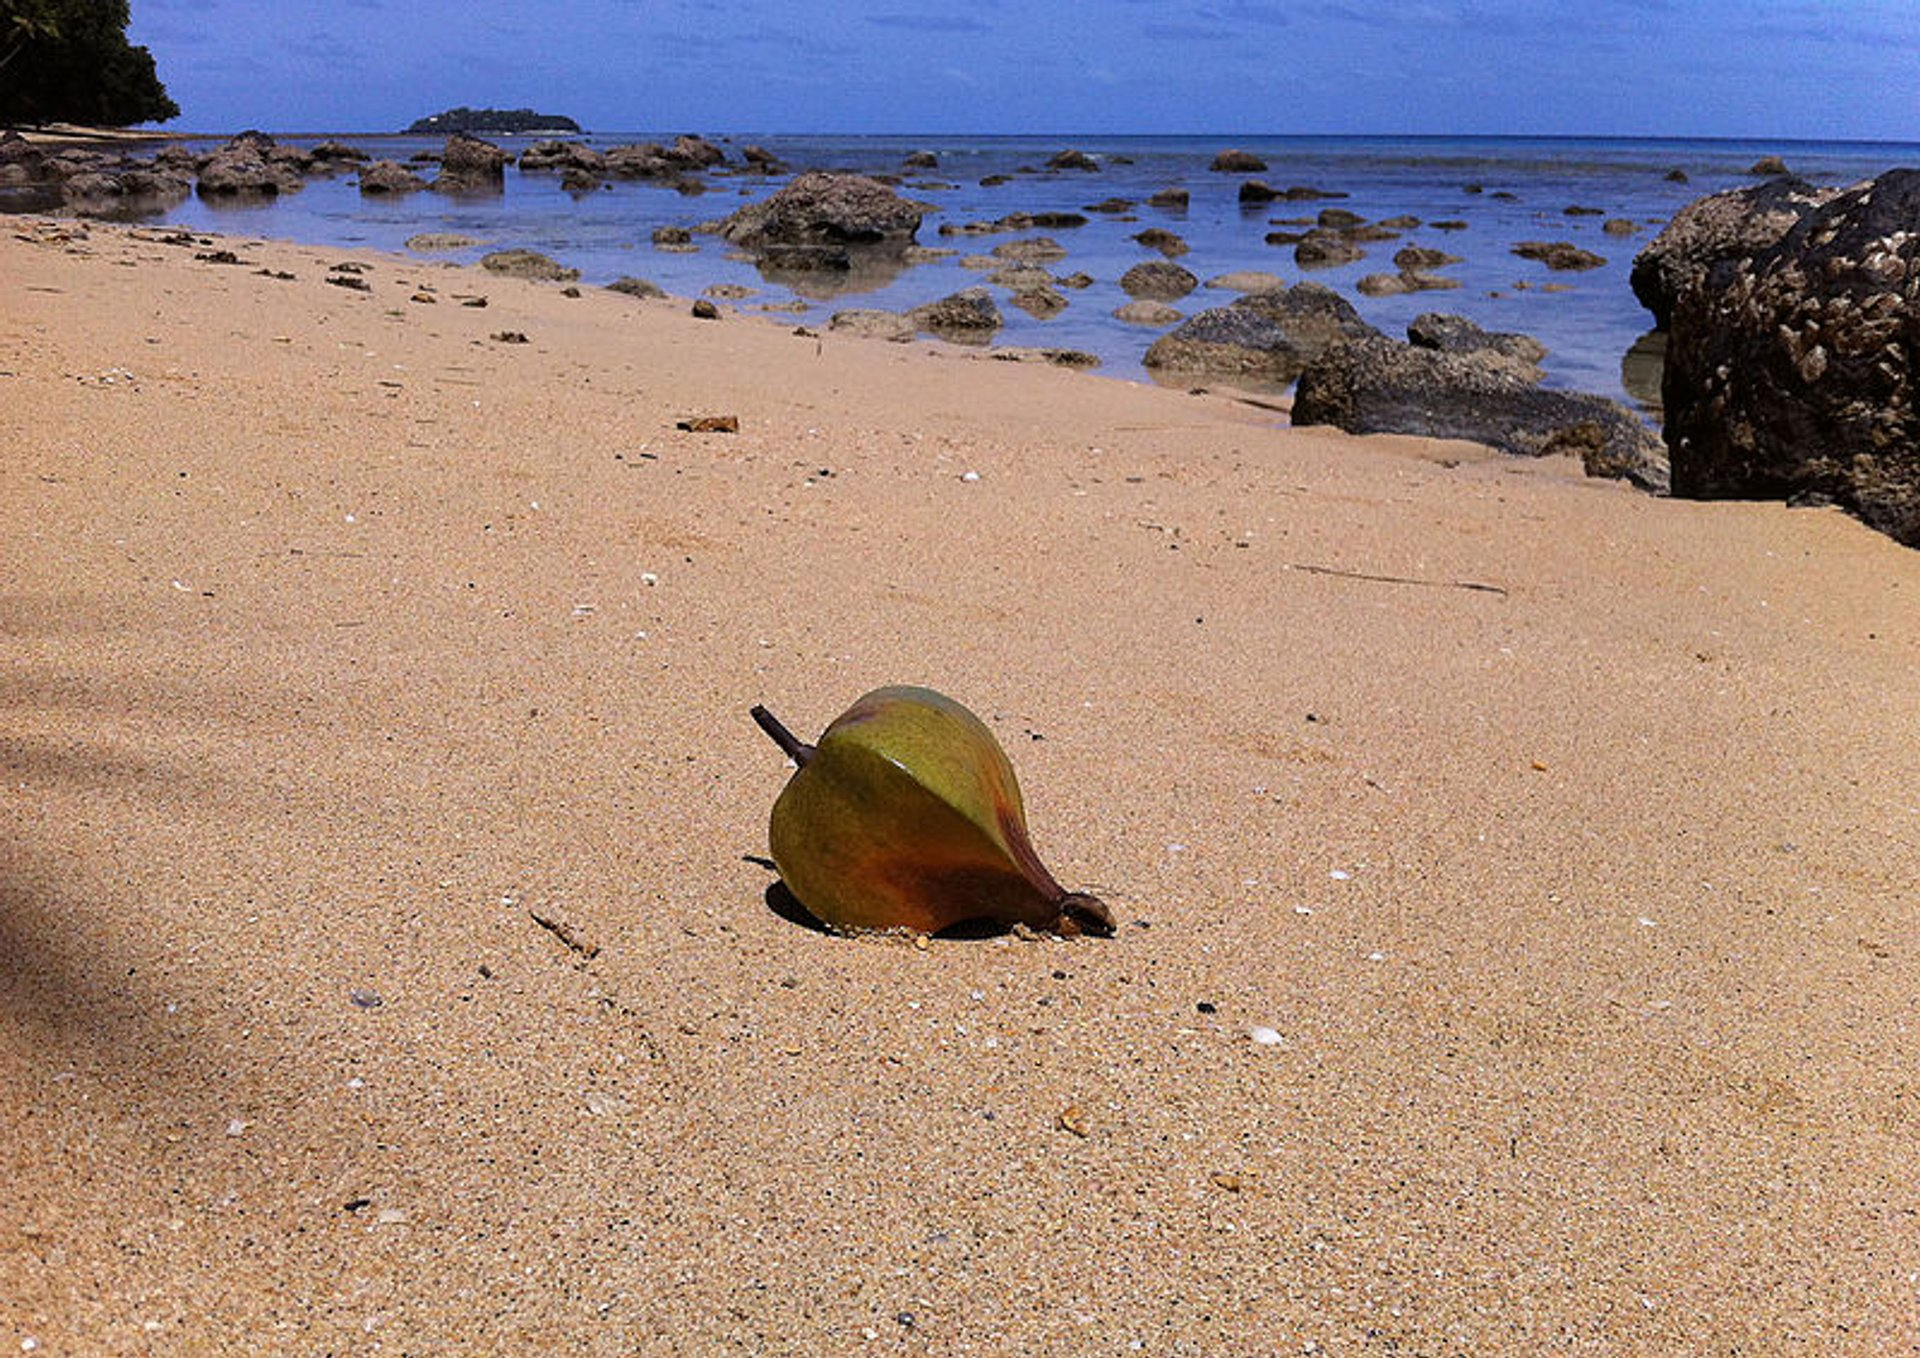 Fruit of Barringtonia asiatica on the beach of Lawaki, Beqa Island, Fiji 2019